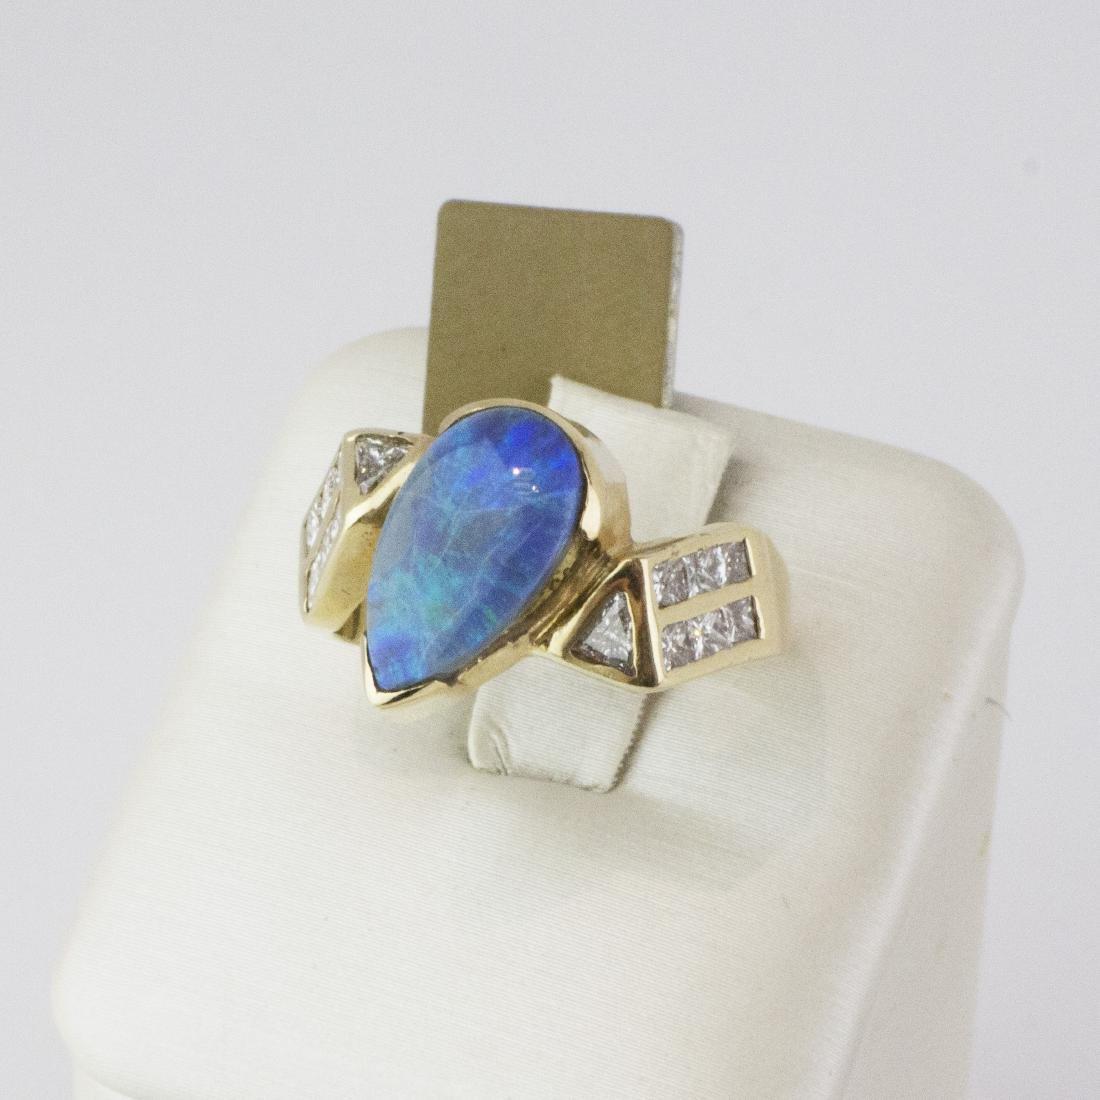 14K Yellow Gold Austrian Opal Diamond Ring - 6